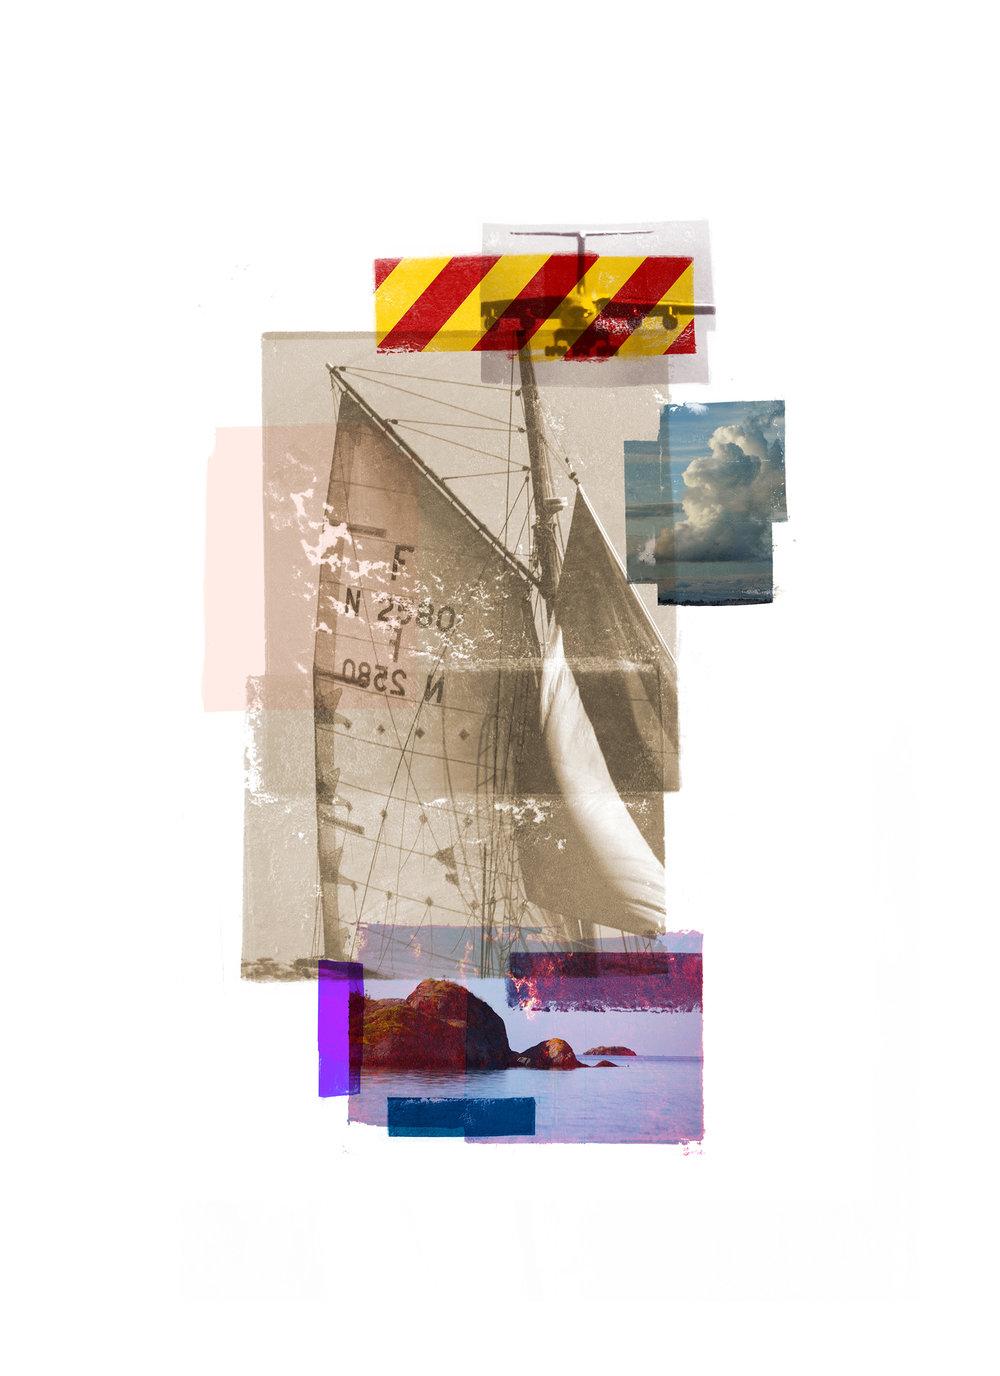 Daydrift / AFG / Archipelago   Original Archival UV Pigment Print / BFK Rives 250 gr 18 x 25 cm / 7 x 9,8 in Edition of 50 + 7 Ap Editeur: Per Fronth Studios / Printer Henrik Aunevik  11/2015: